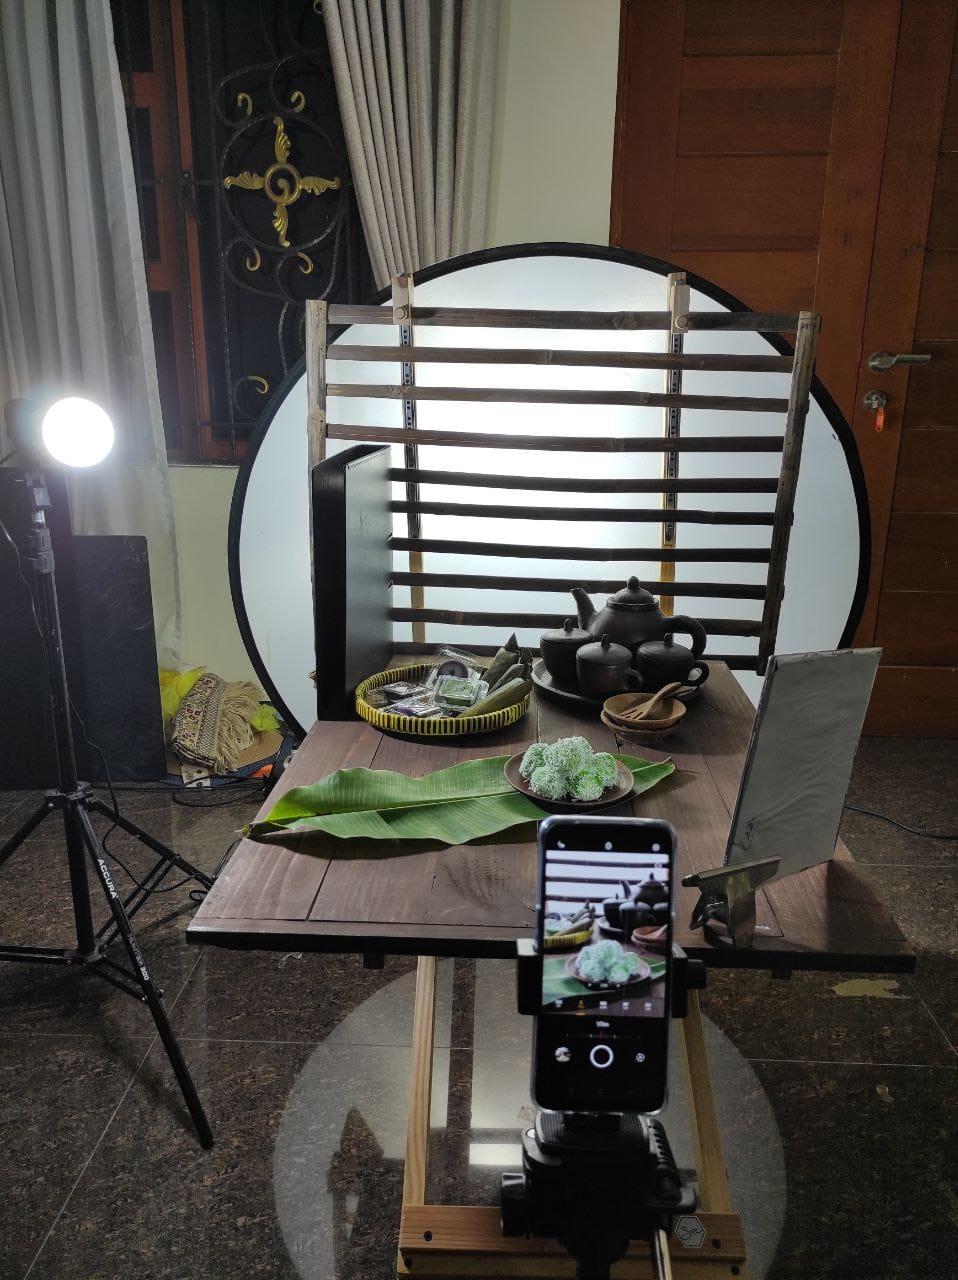 Foto Produk UMKM dari Smartphone - Meyani (6)